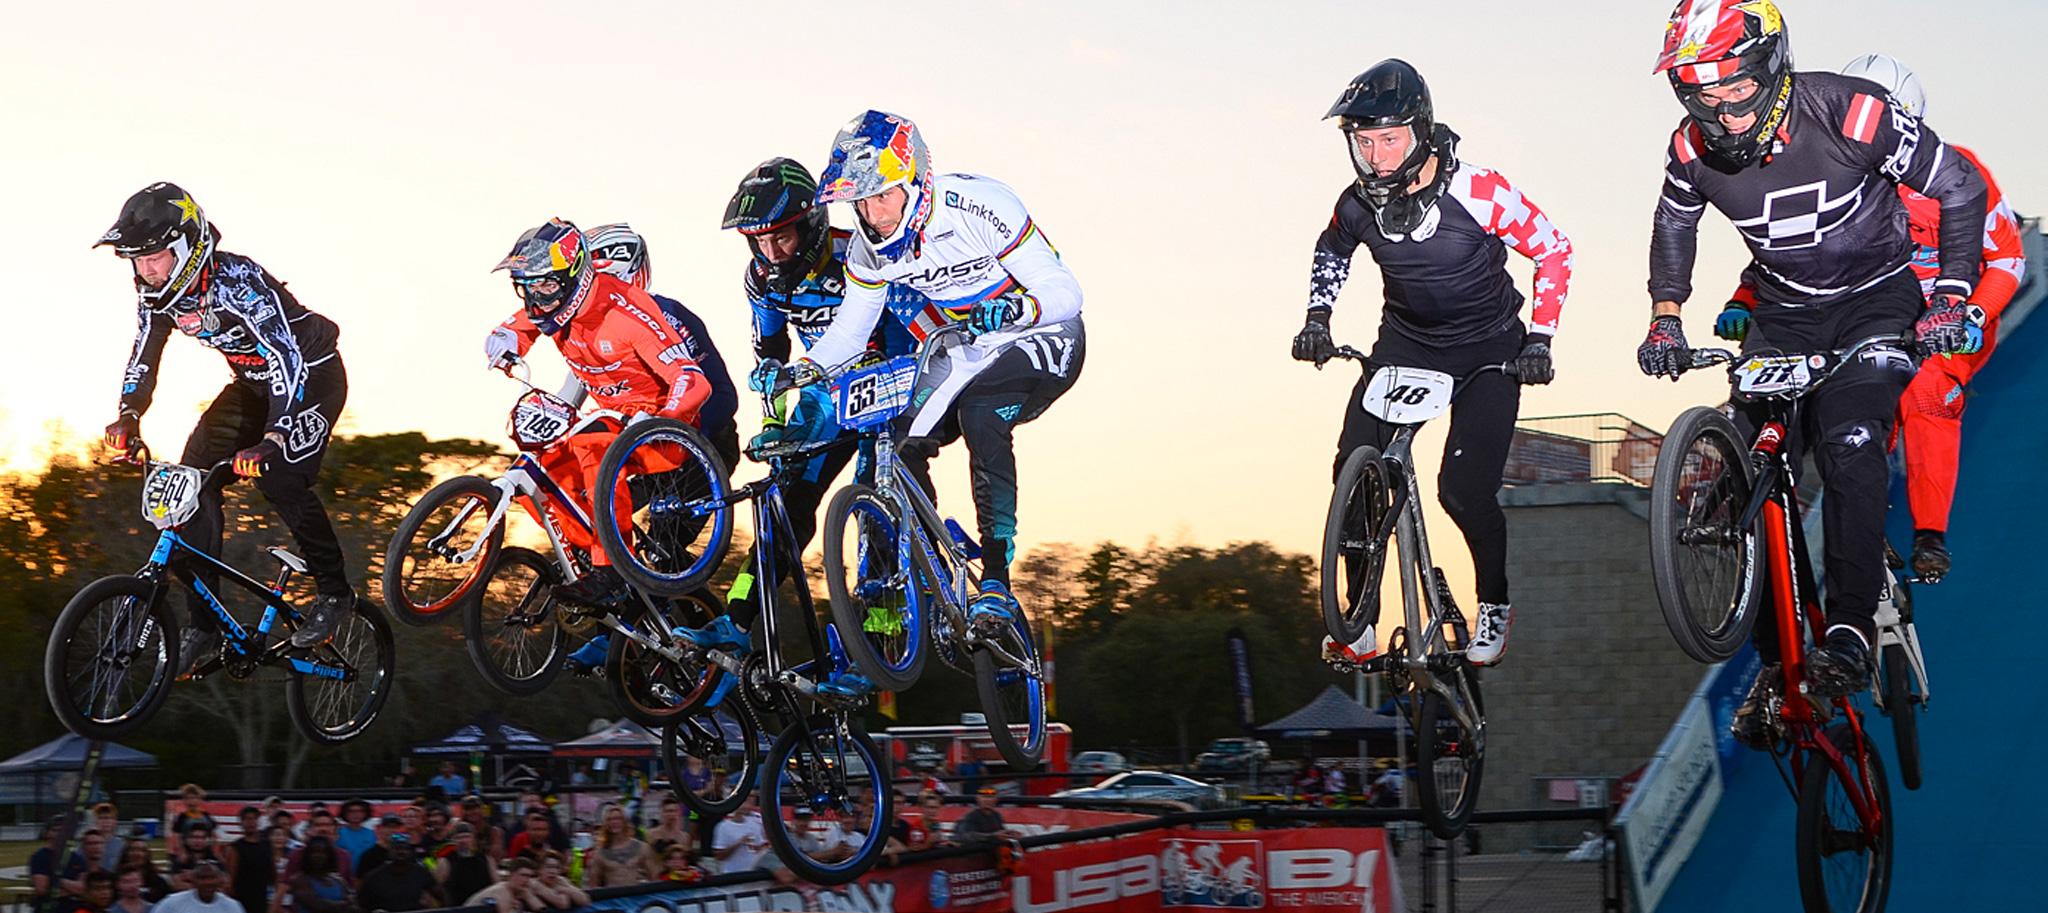 Daudet Wins & Mahieu 2nd at USA BMX North American SX Series